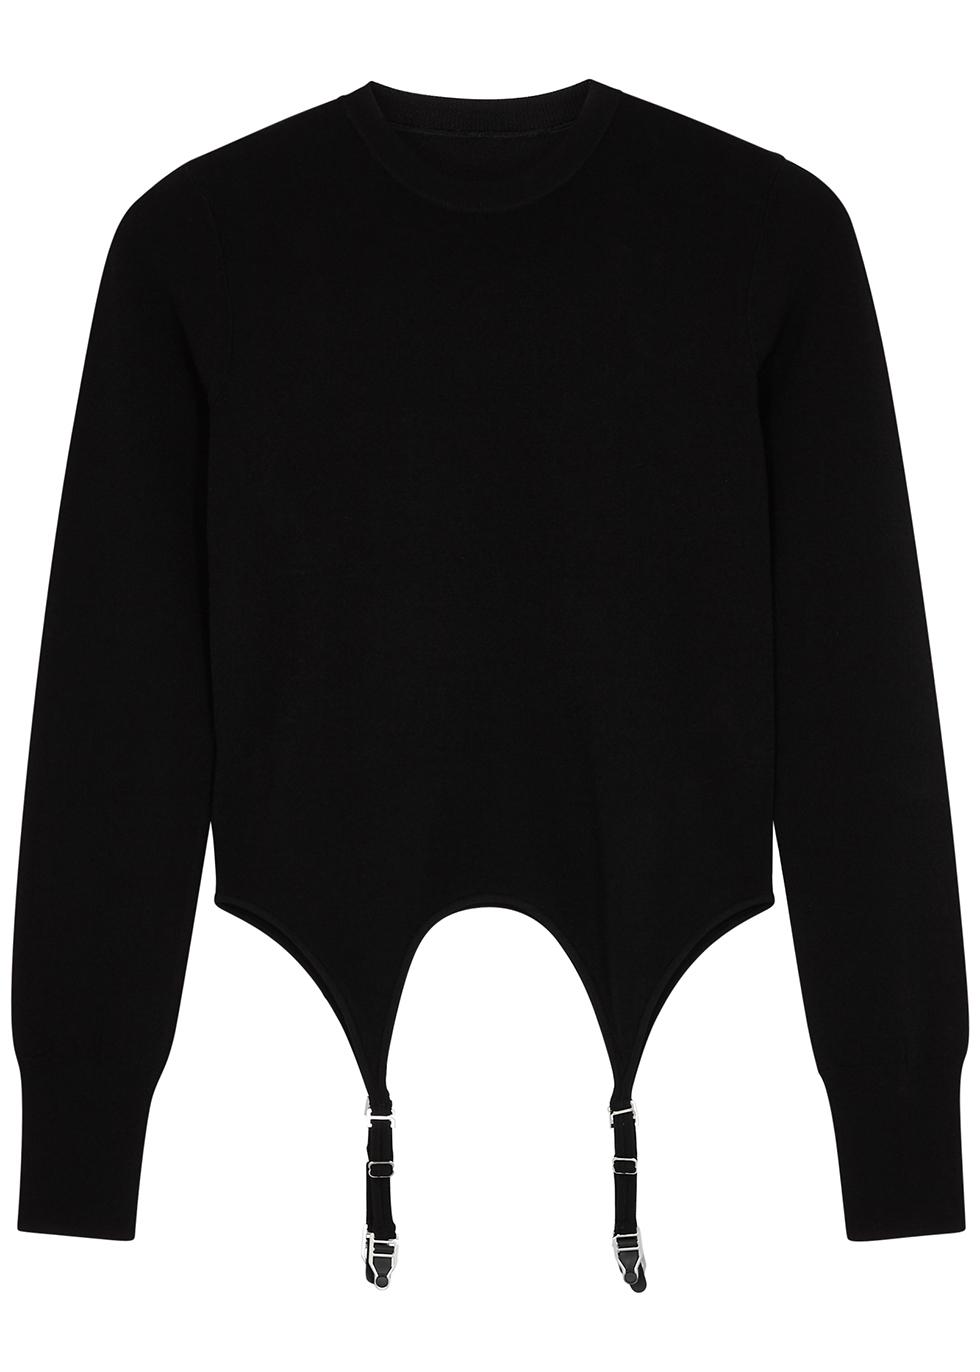 Garter black stretch-jersey top